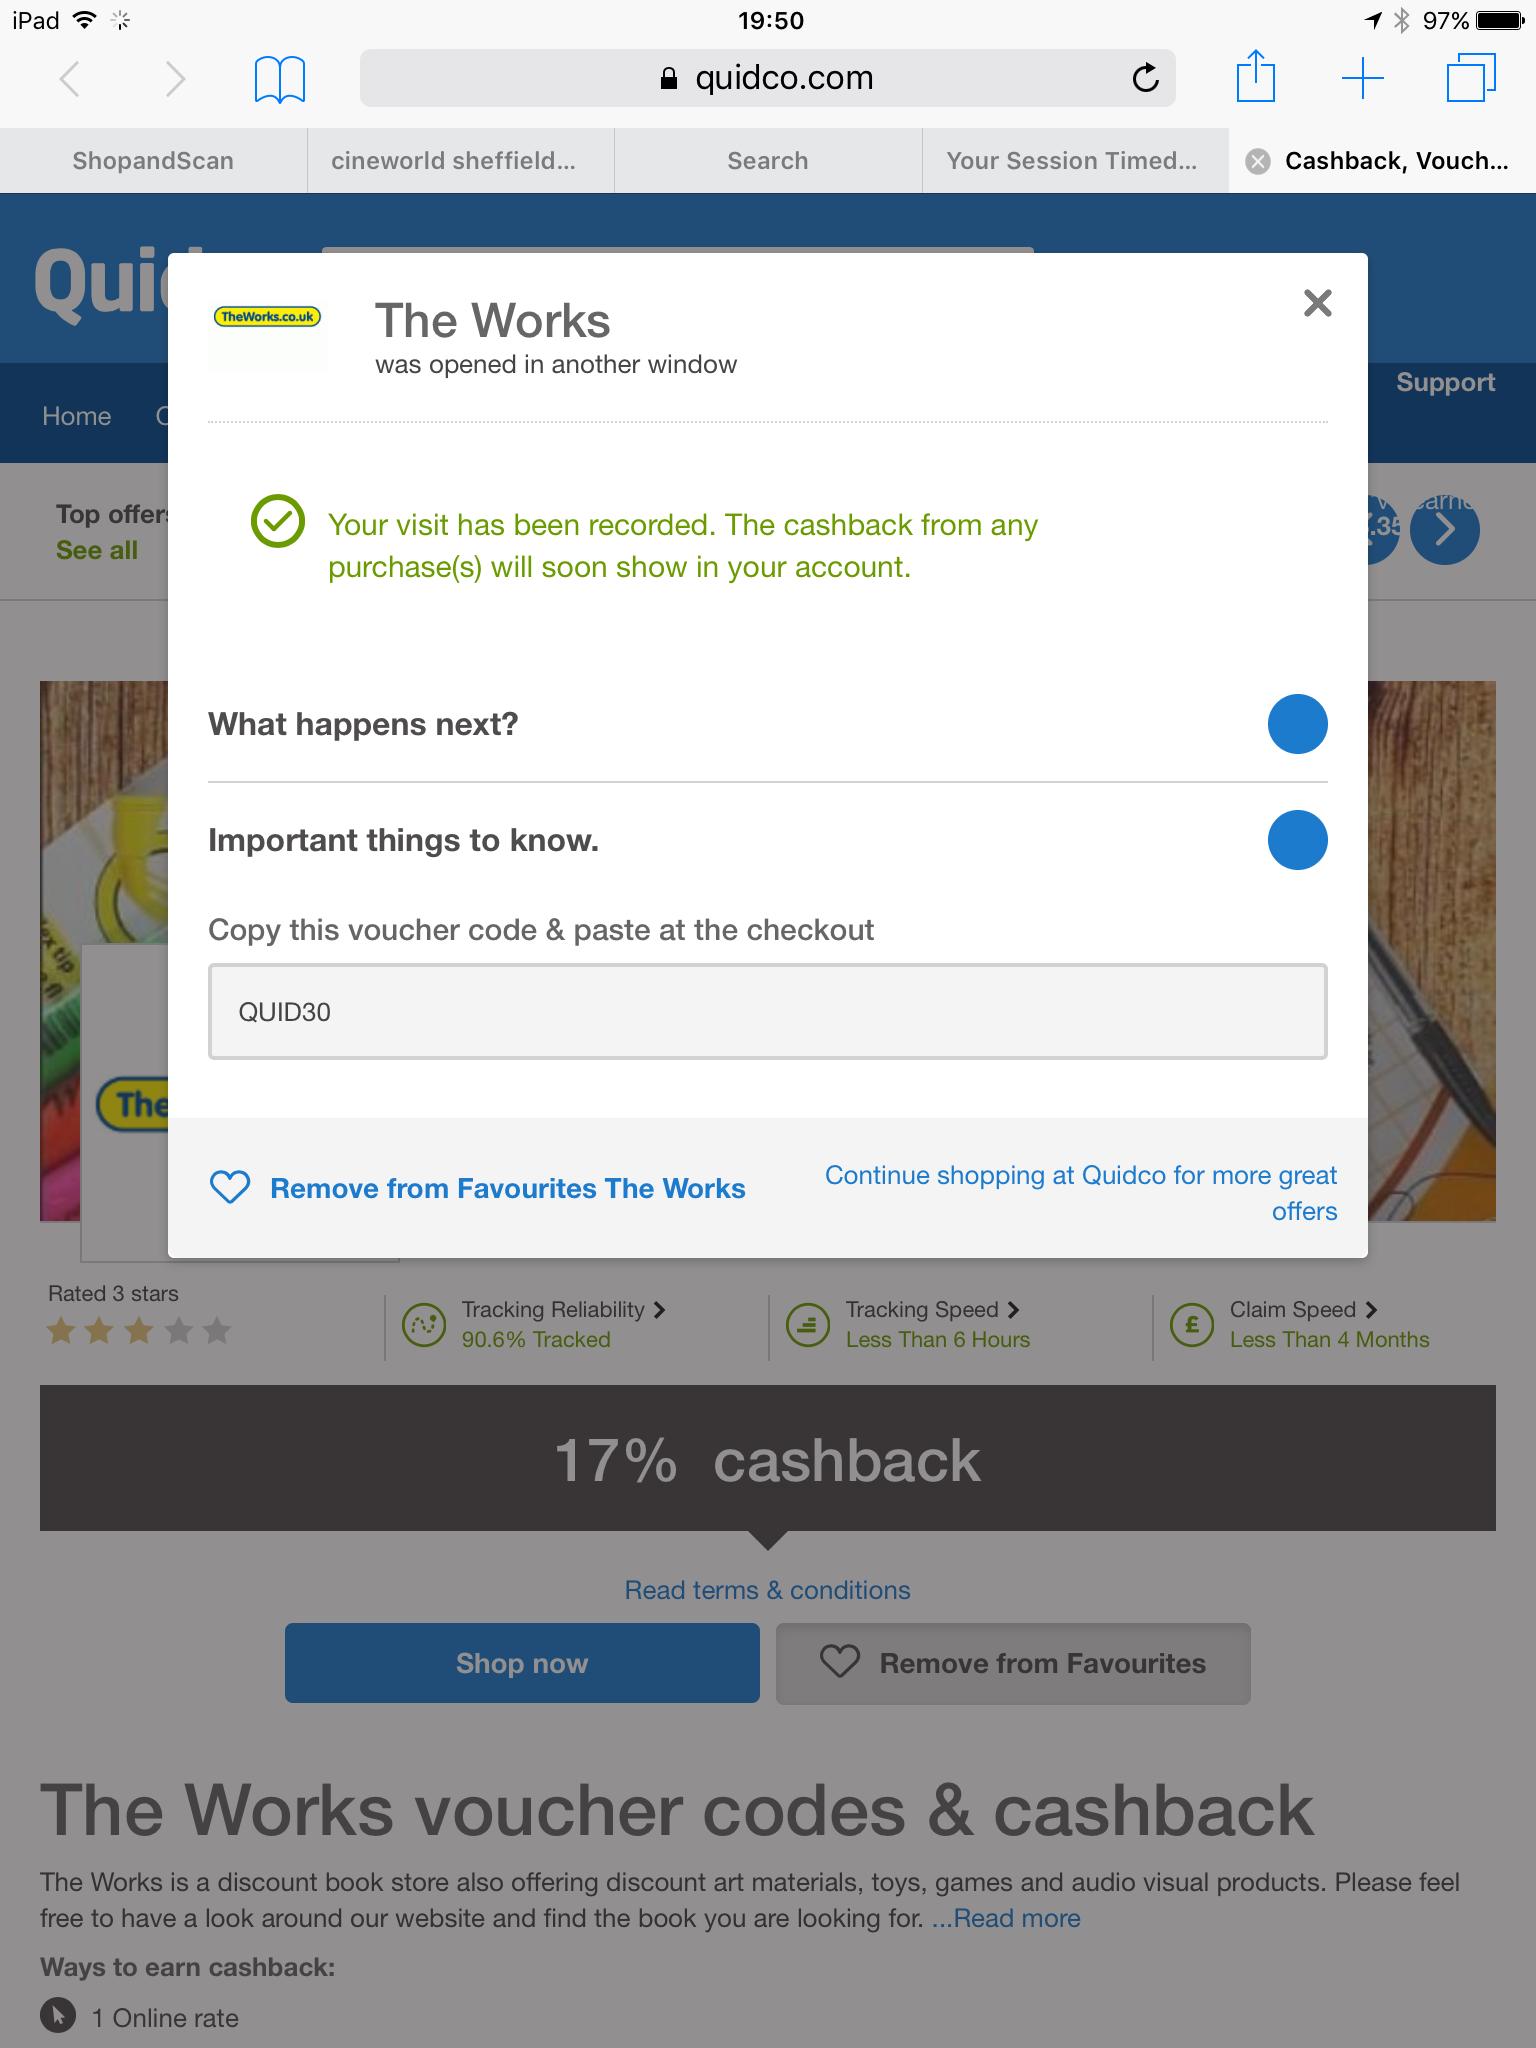 Quidco exclusive 17% cash back on TheWorks online (minimum spend £30)